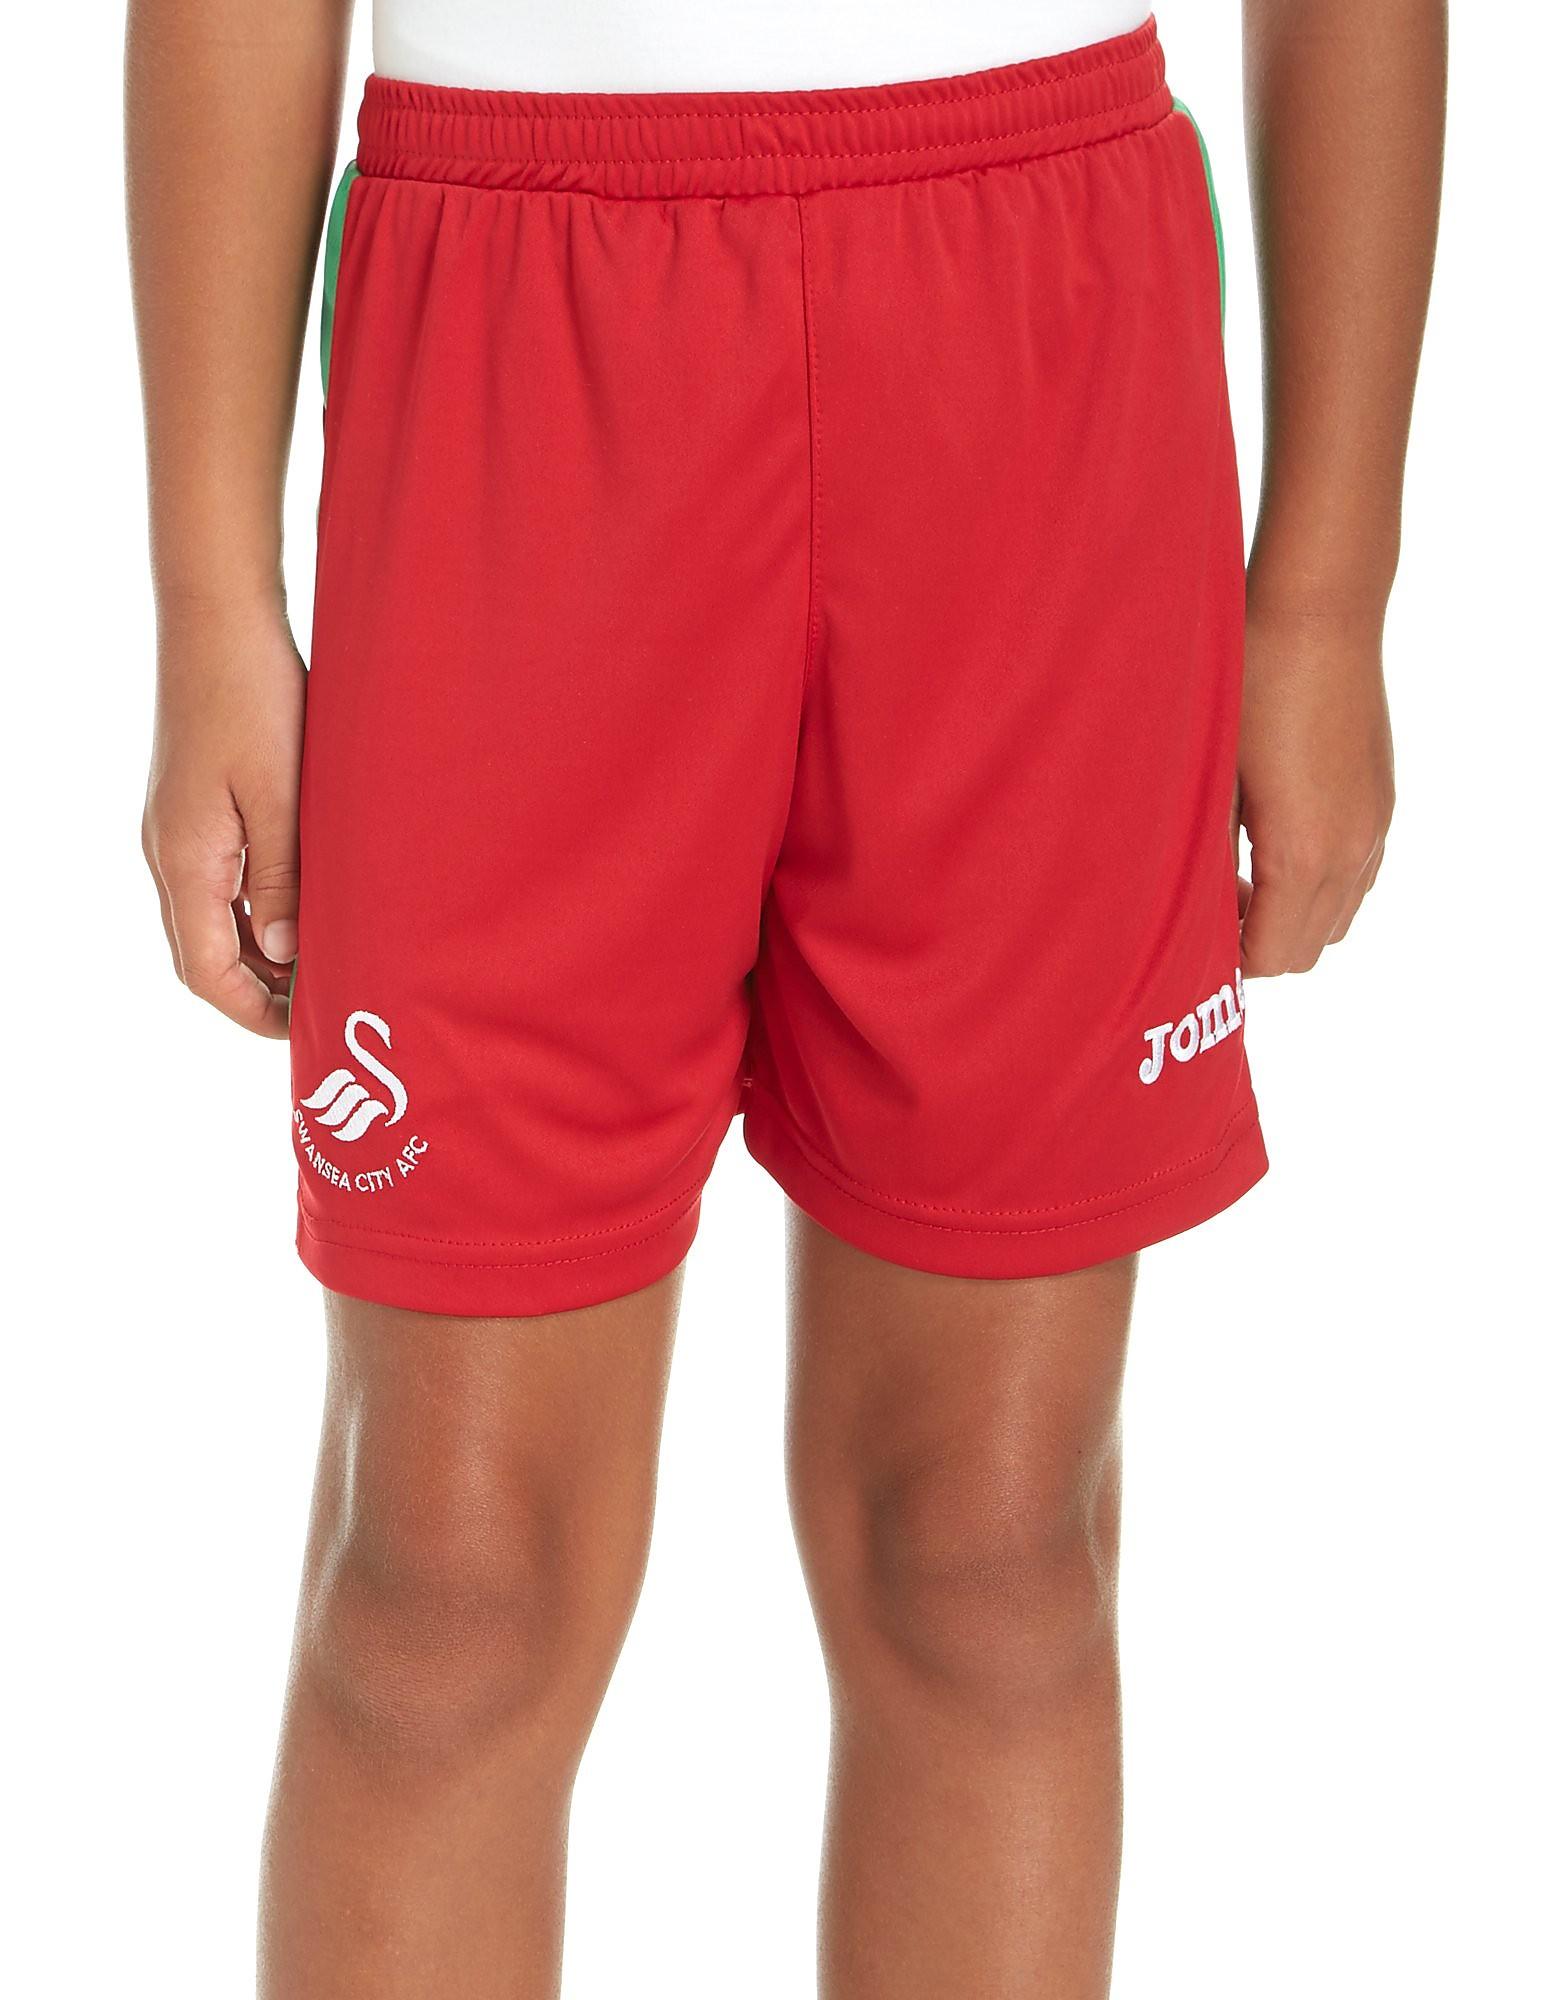 Joma Swansea City FC 2017/18 Away Shorts Junior